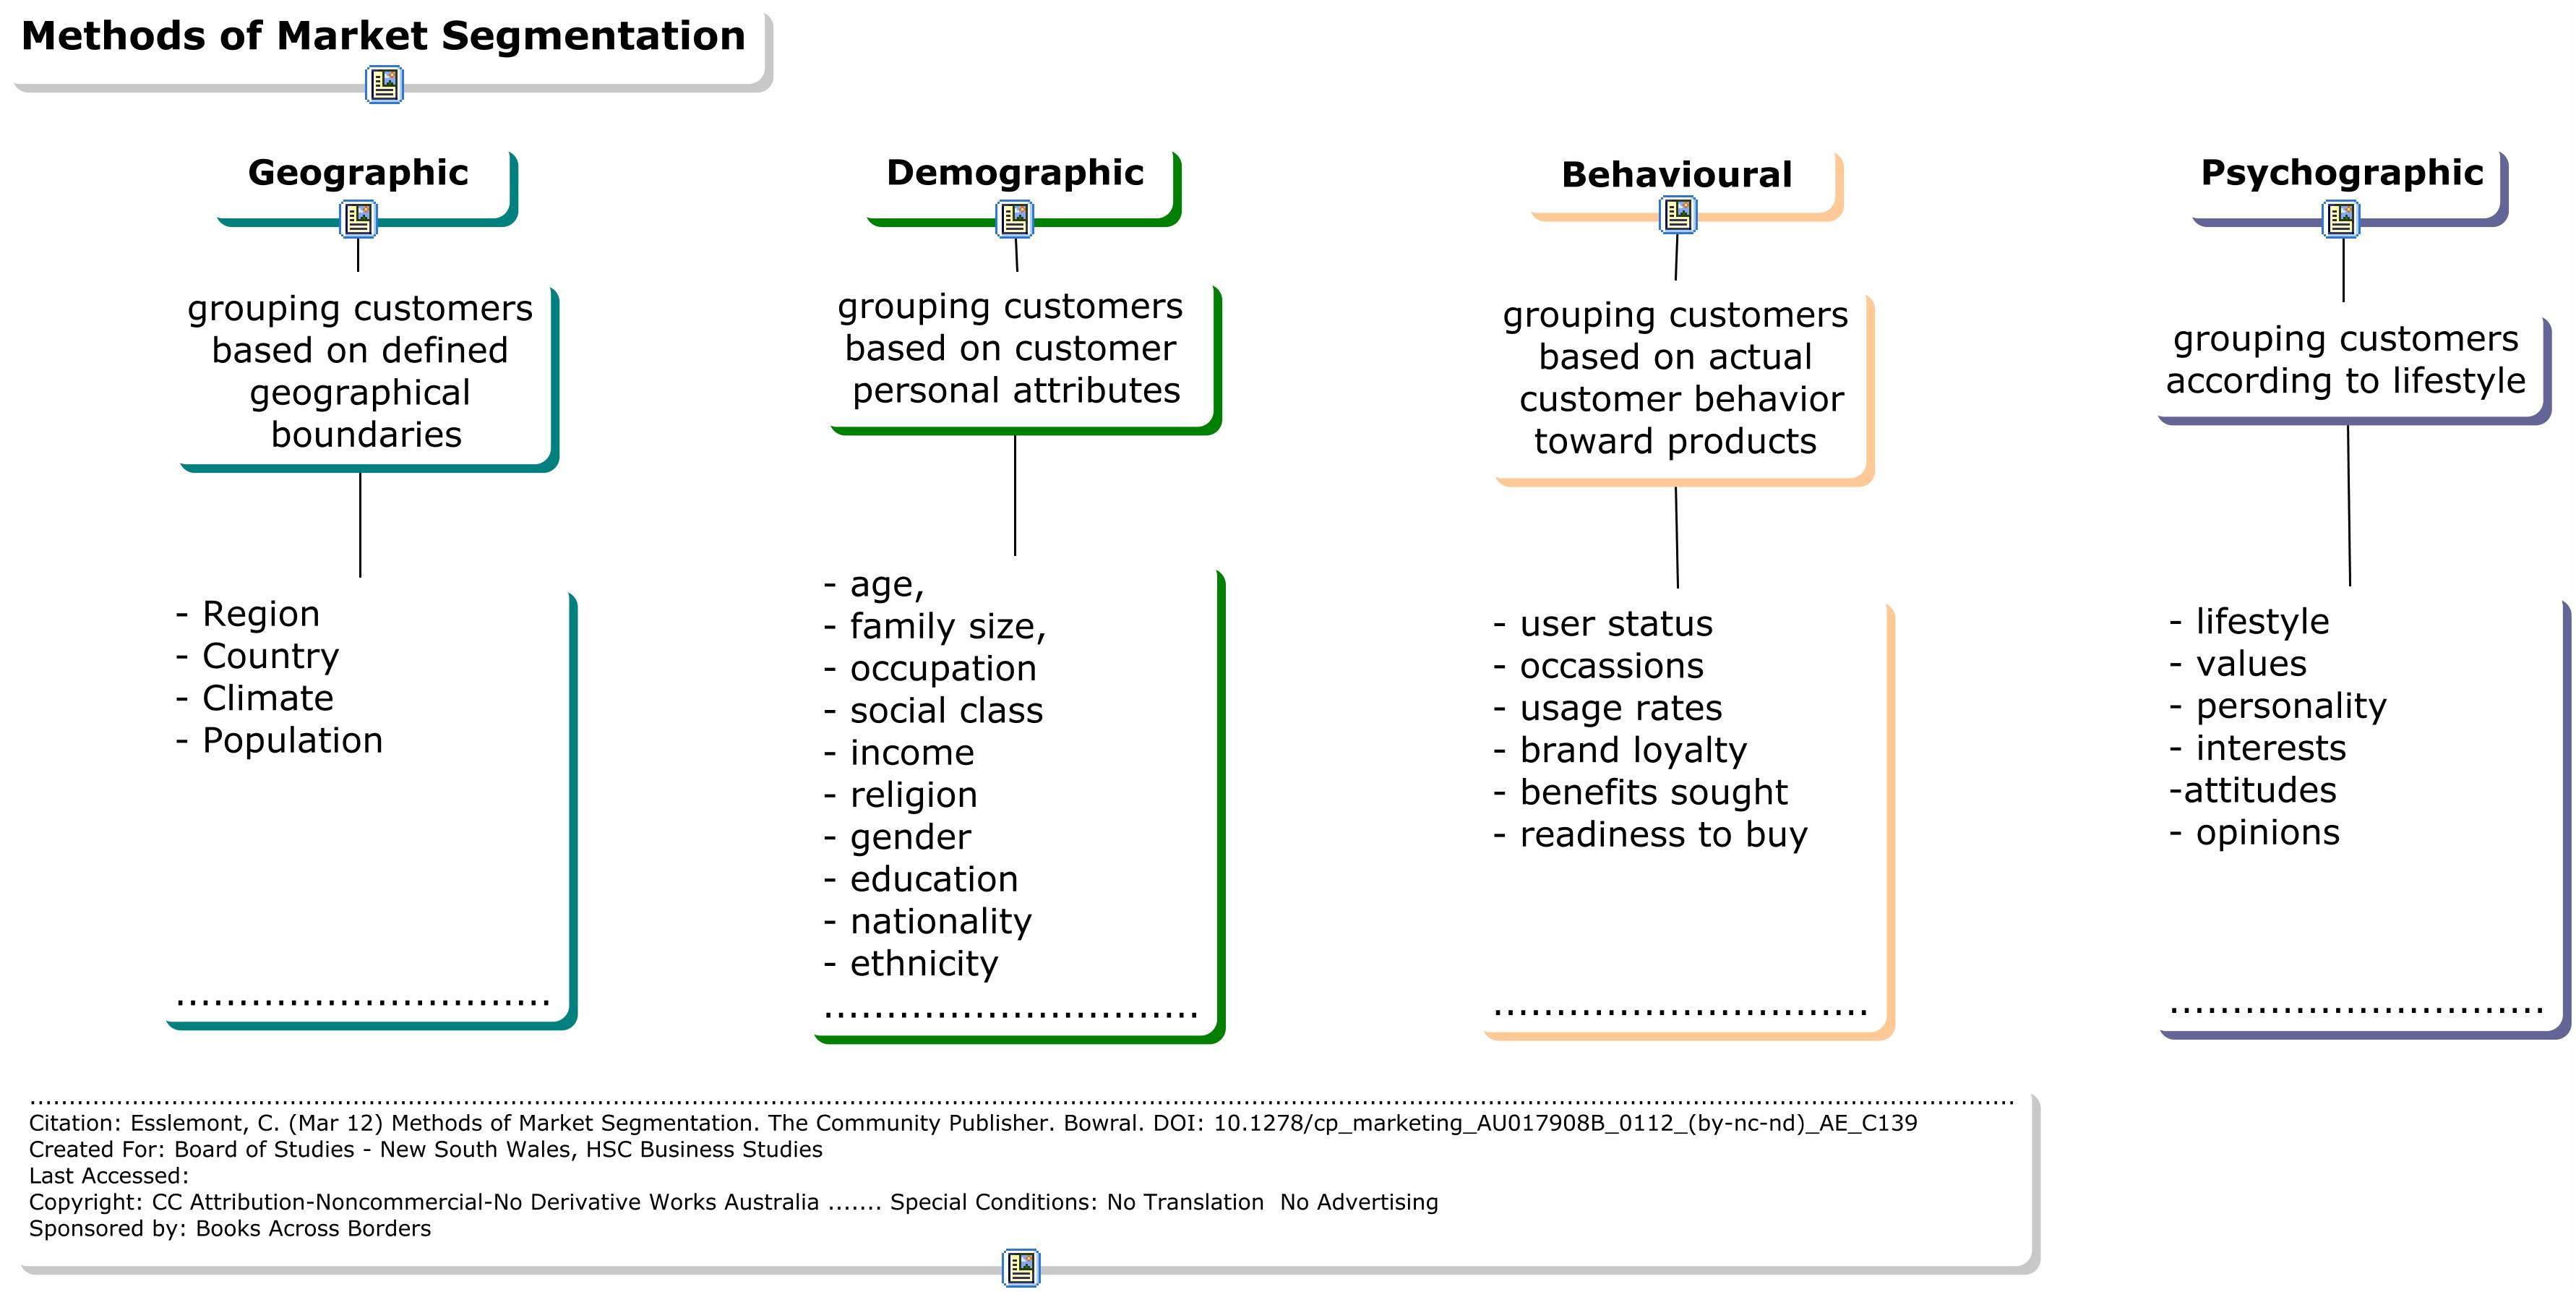 New methods of market segmentation